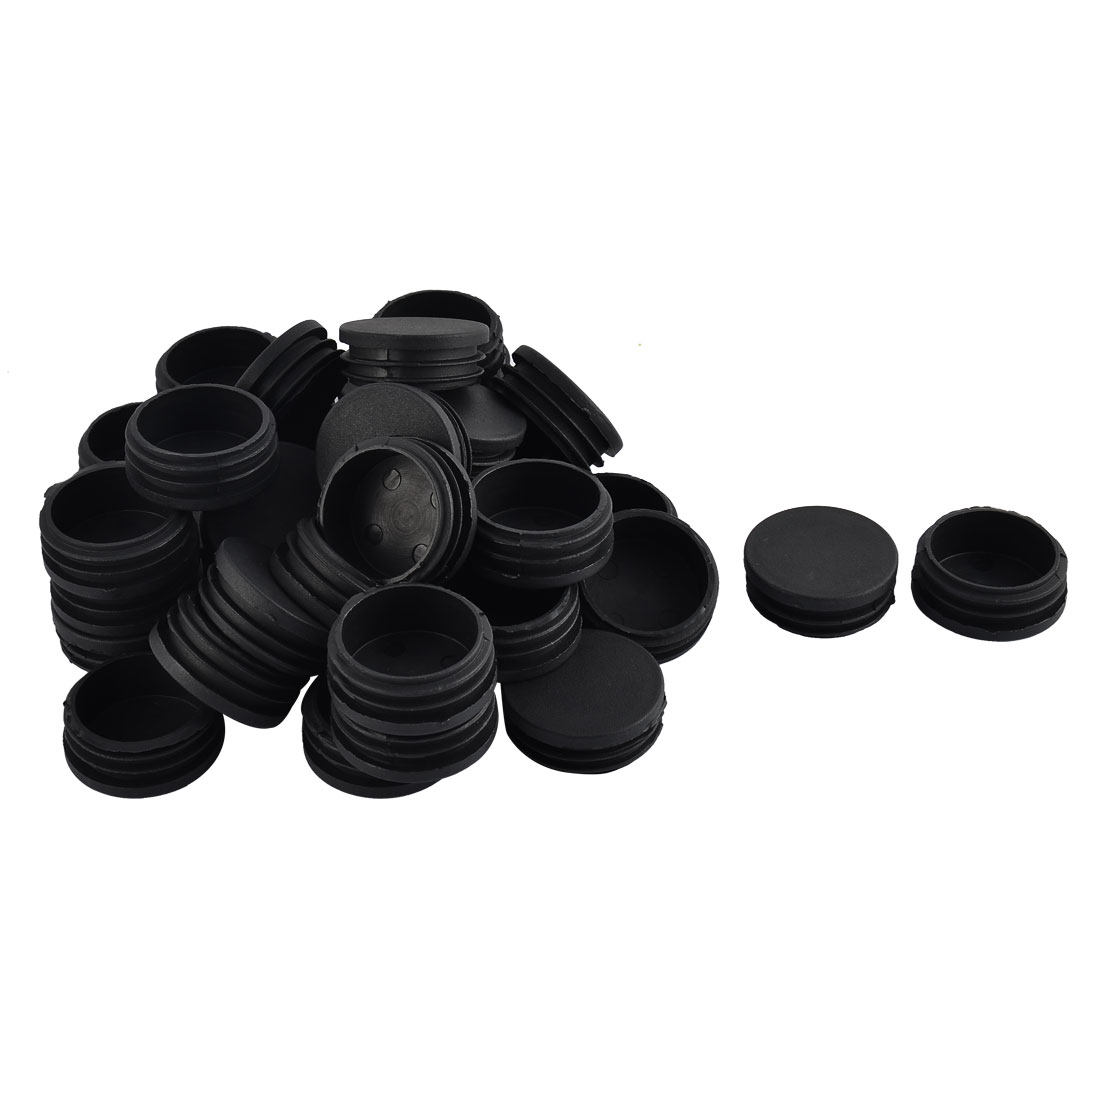 Furniture Table Chair Legs Plastic Round Tube Pipe Insert Cap Cover Black 45mm Dia 40pcs